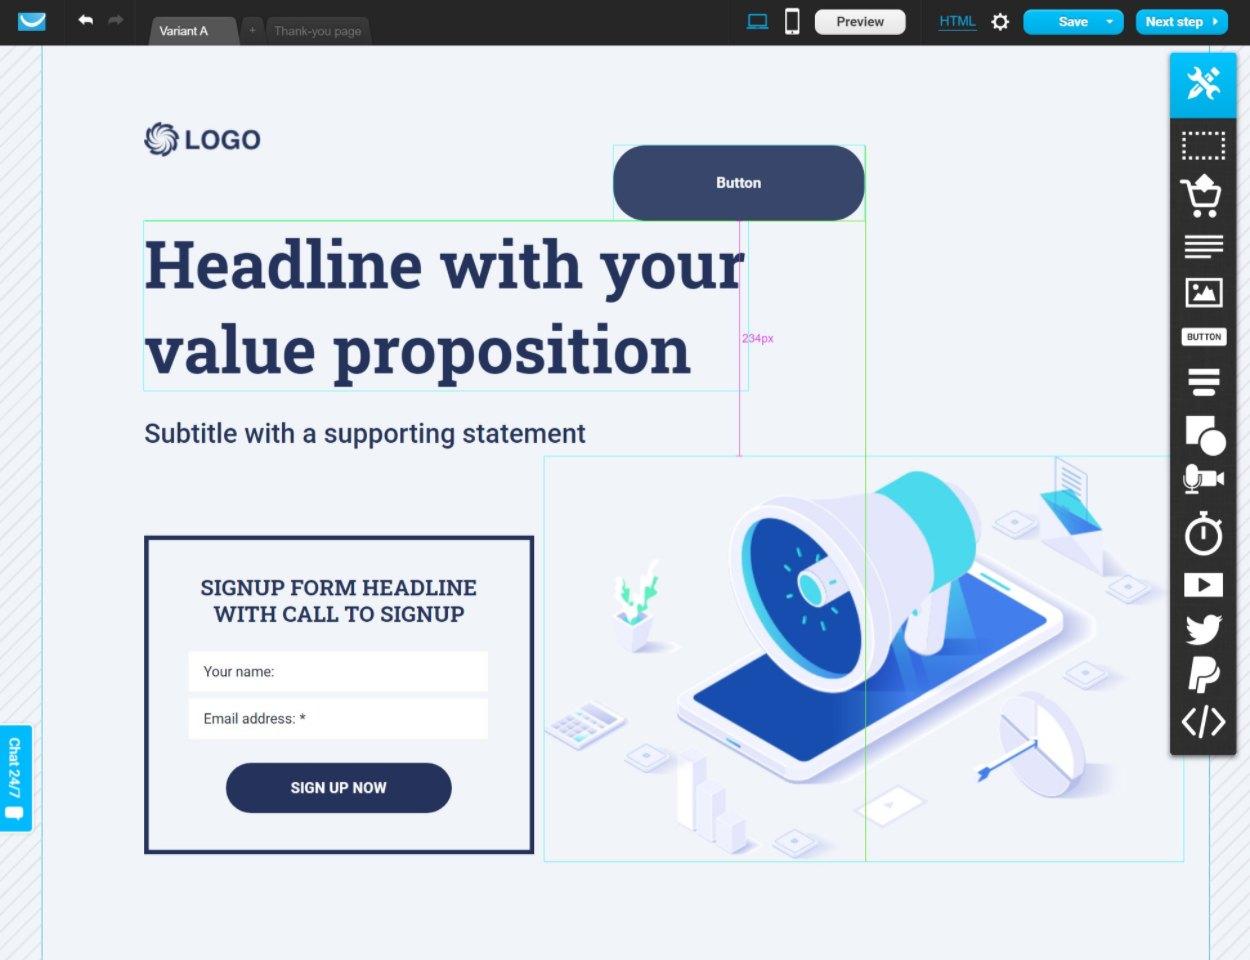 GetResponse website builder